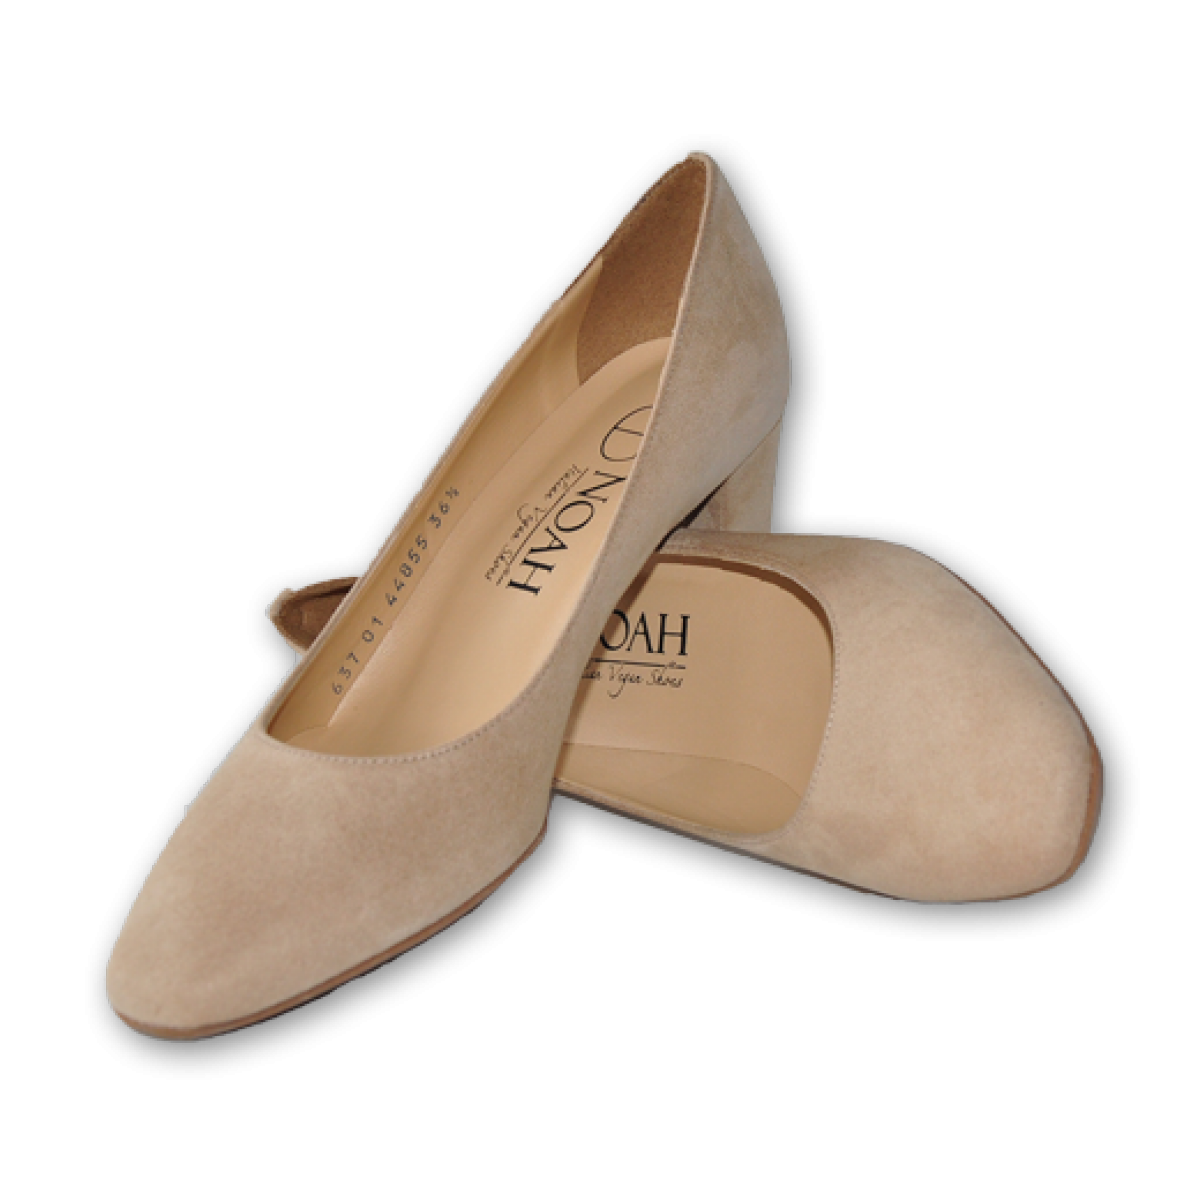 NOAH™️ Italian Vegan Shoes | Simple pumps made from vegan